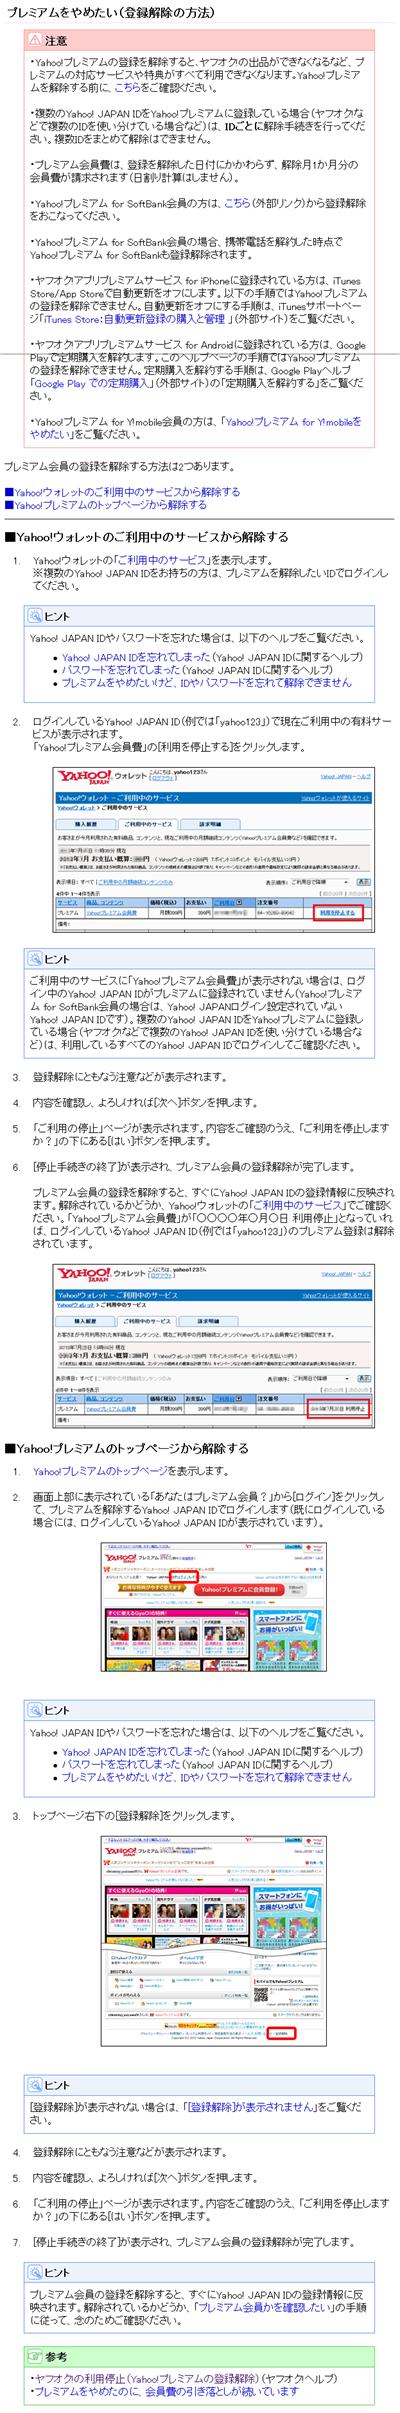 Yahoo!プレミアムヘルプ-プレミアムをやめたい(登録解除の方法)